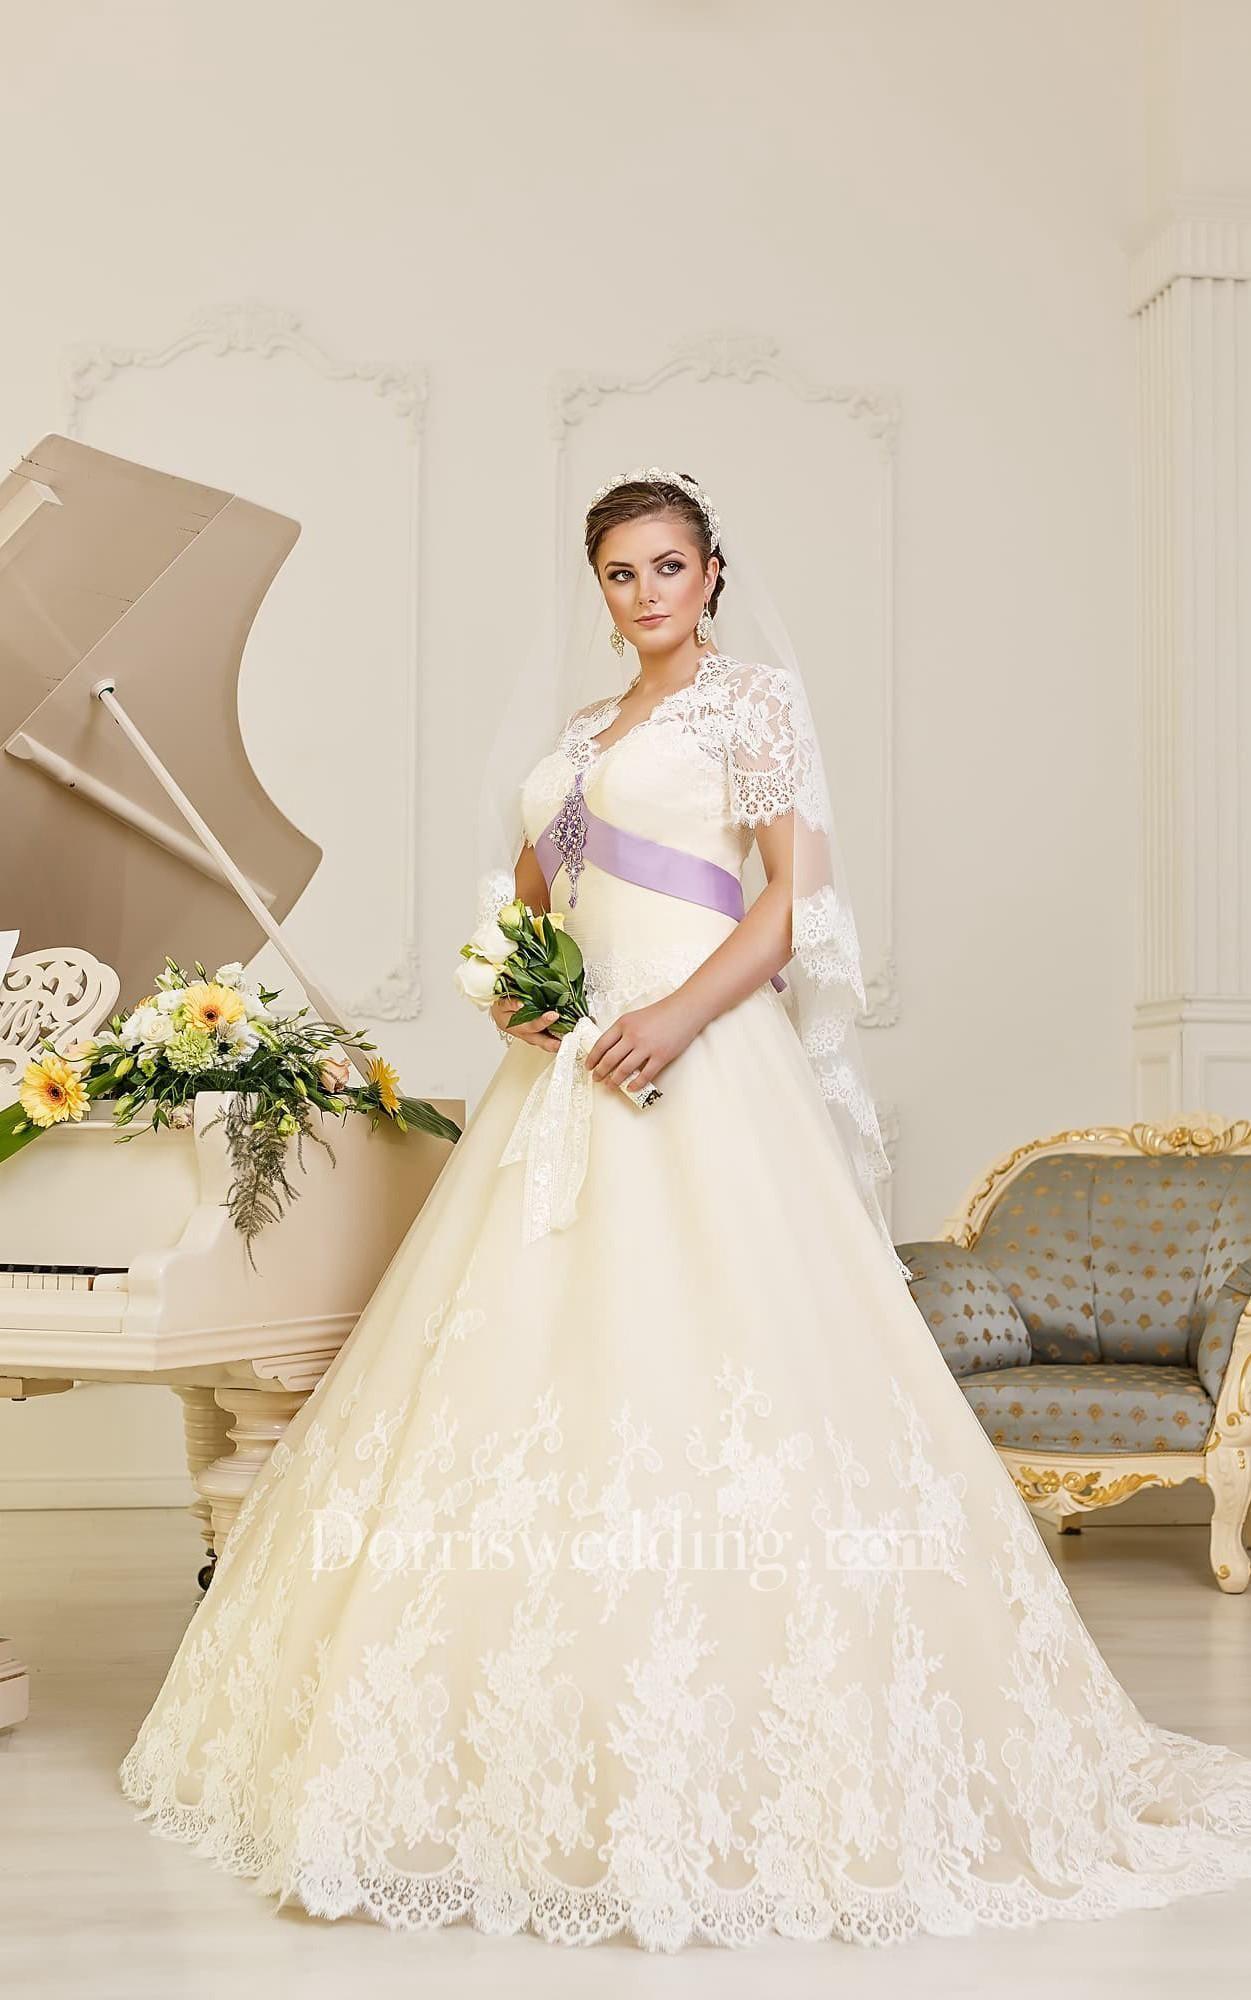 Lace cap sleeve a line wedding dress  Dorris Wedding  Dorris Wedding ALine FloorLength VNeck Cap